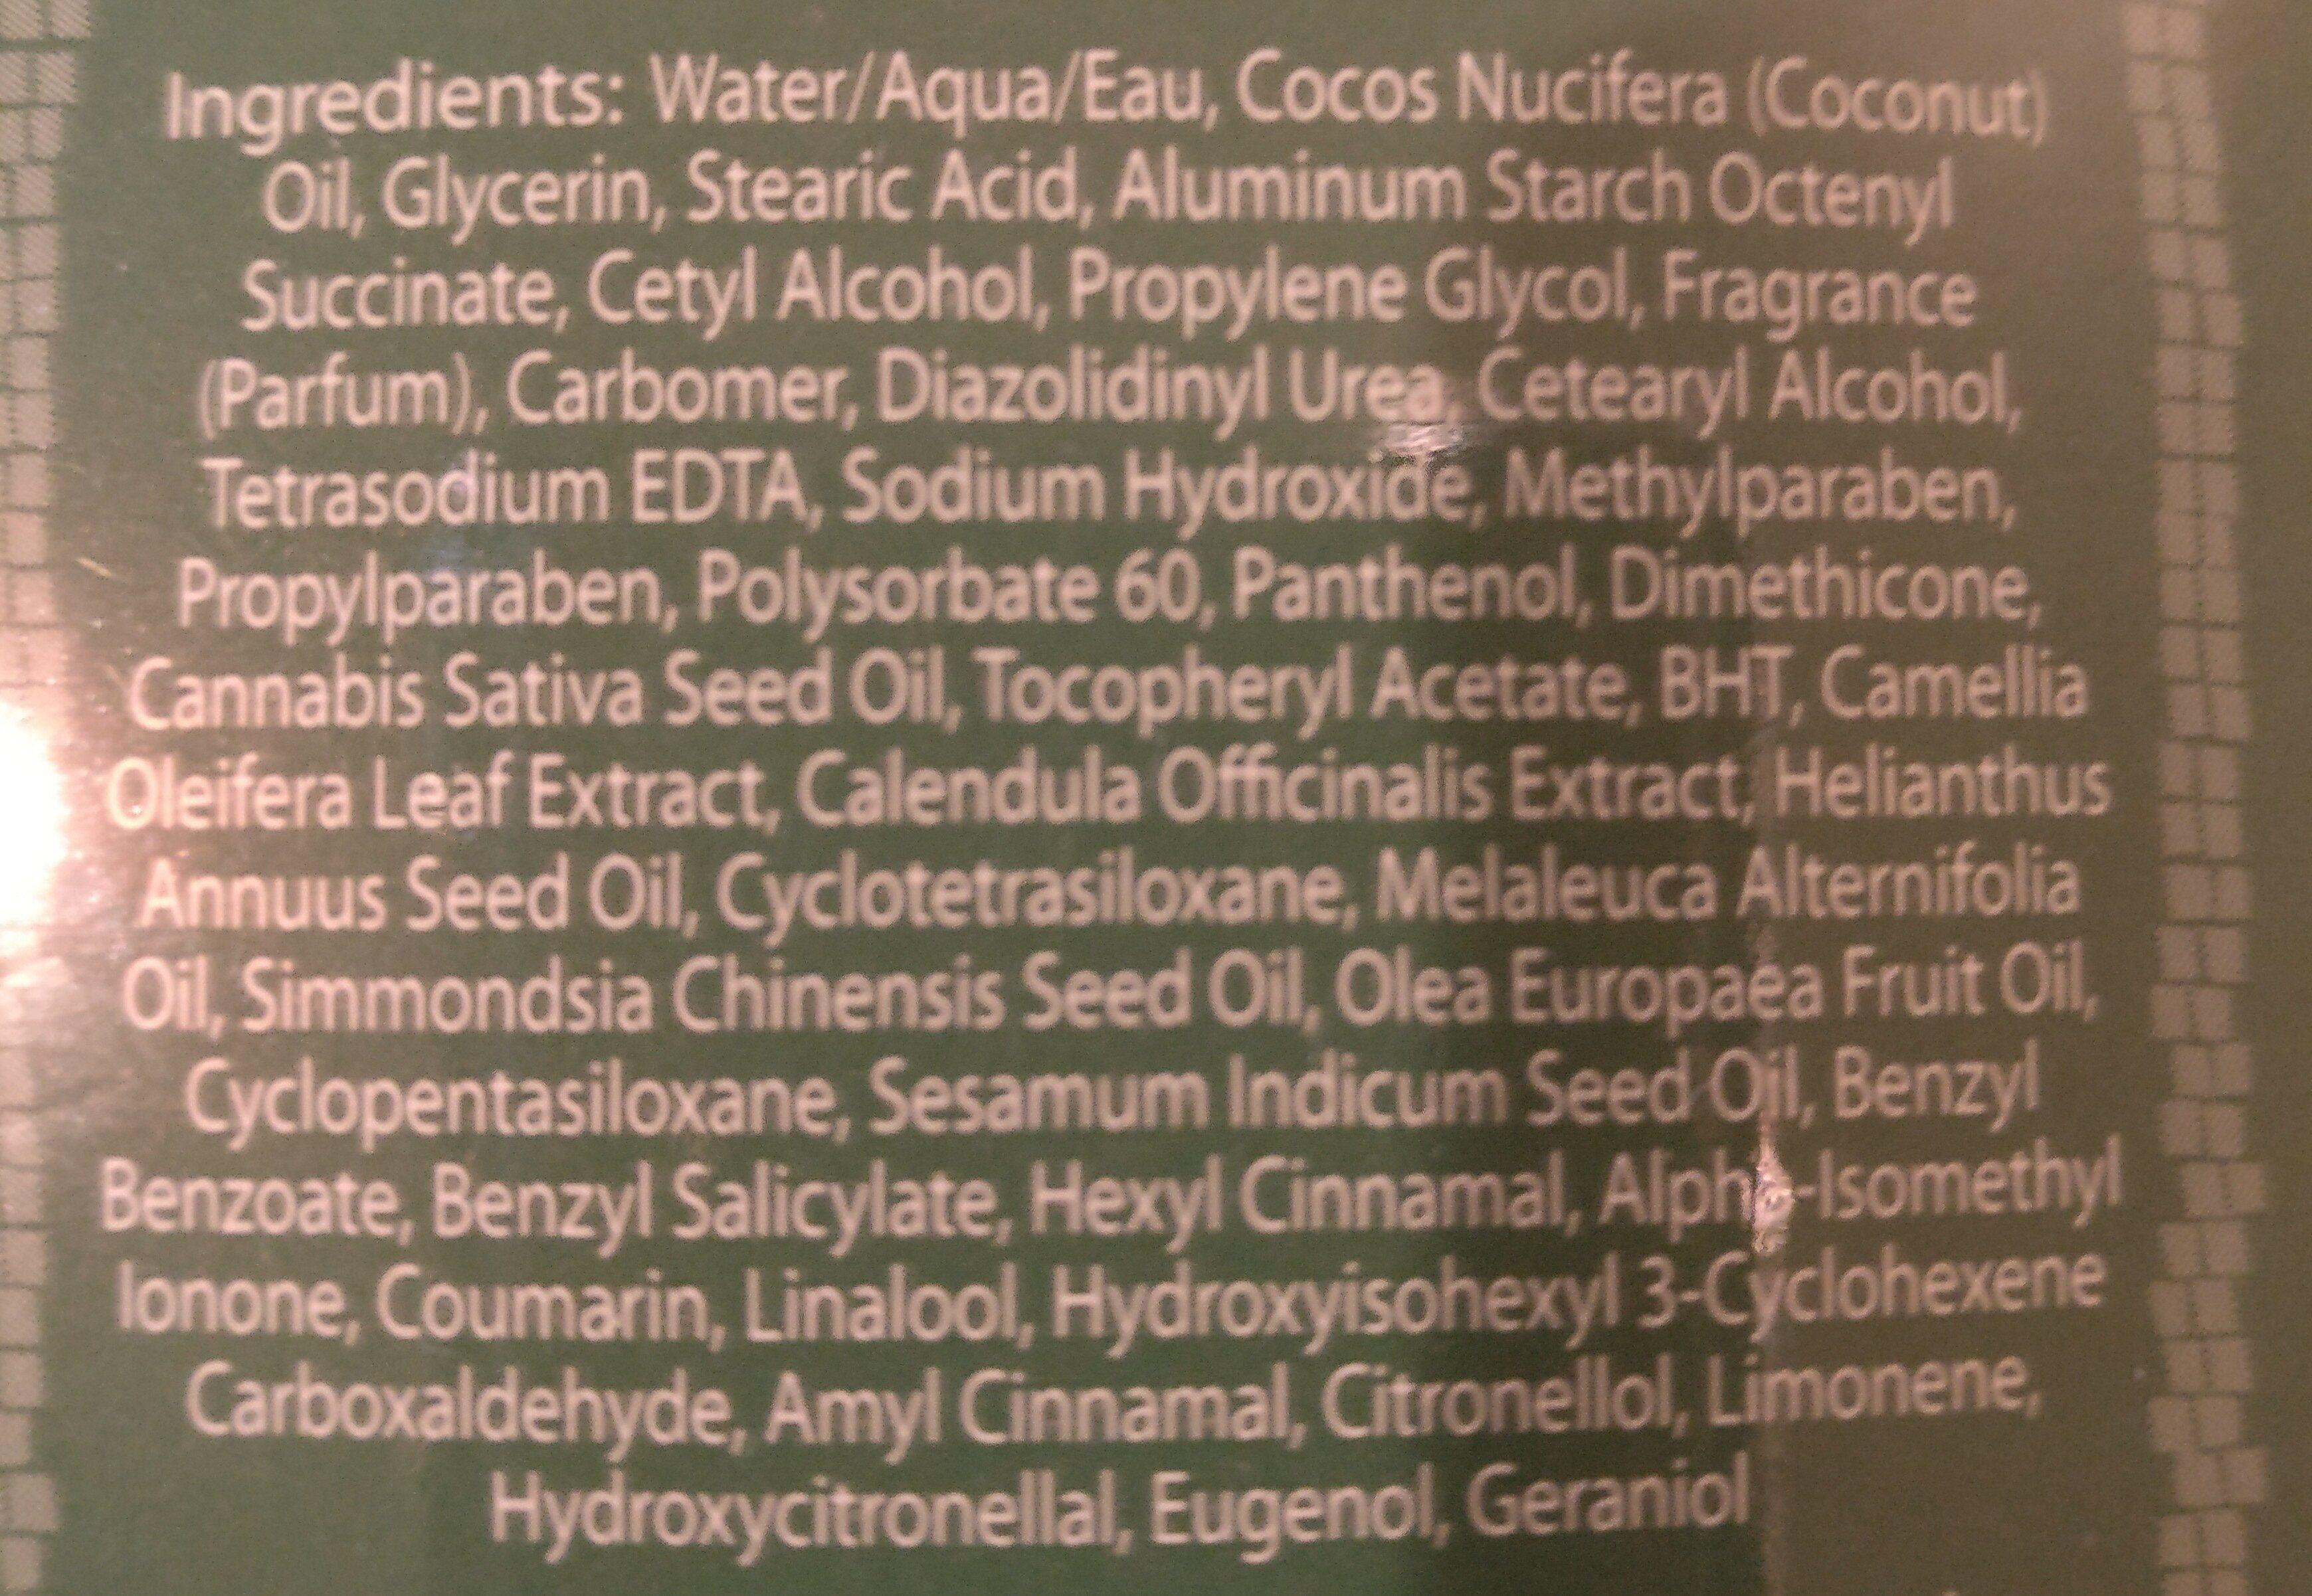 malibu tan hemp moisturizer - Ingredients - en